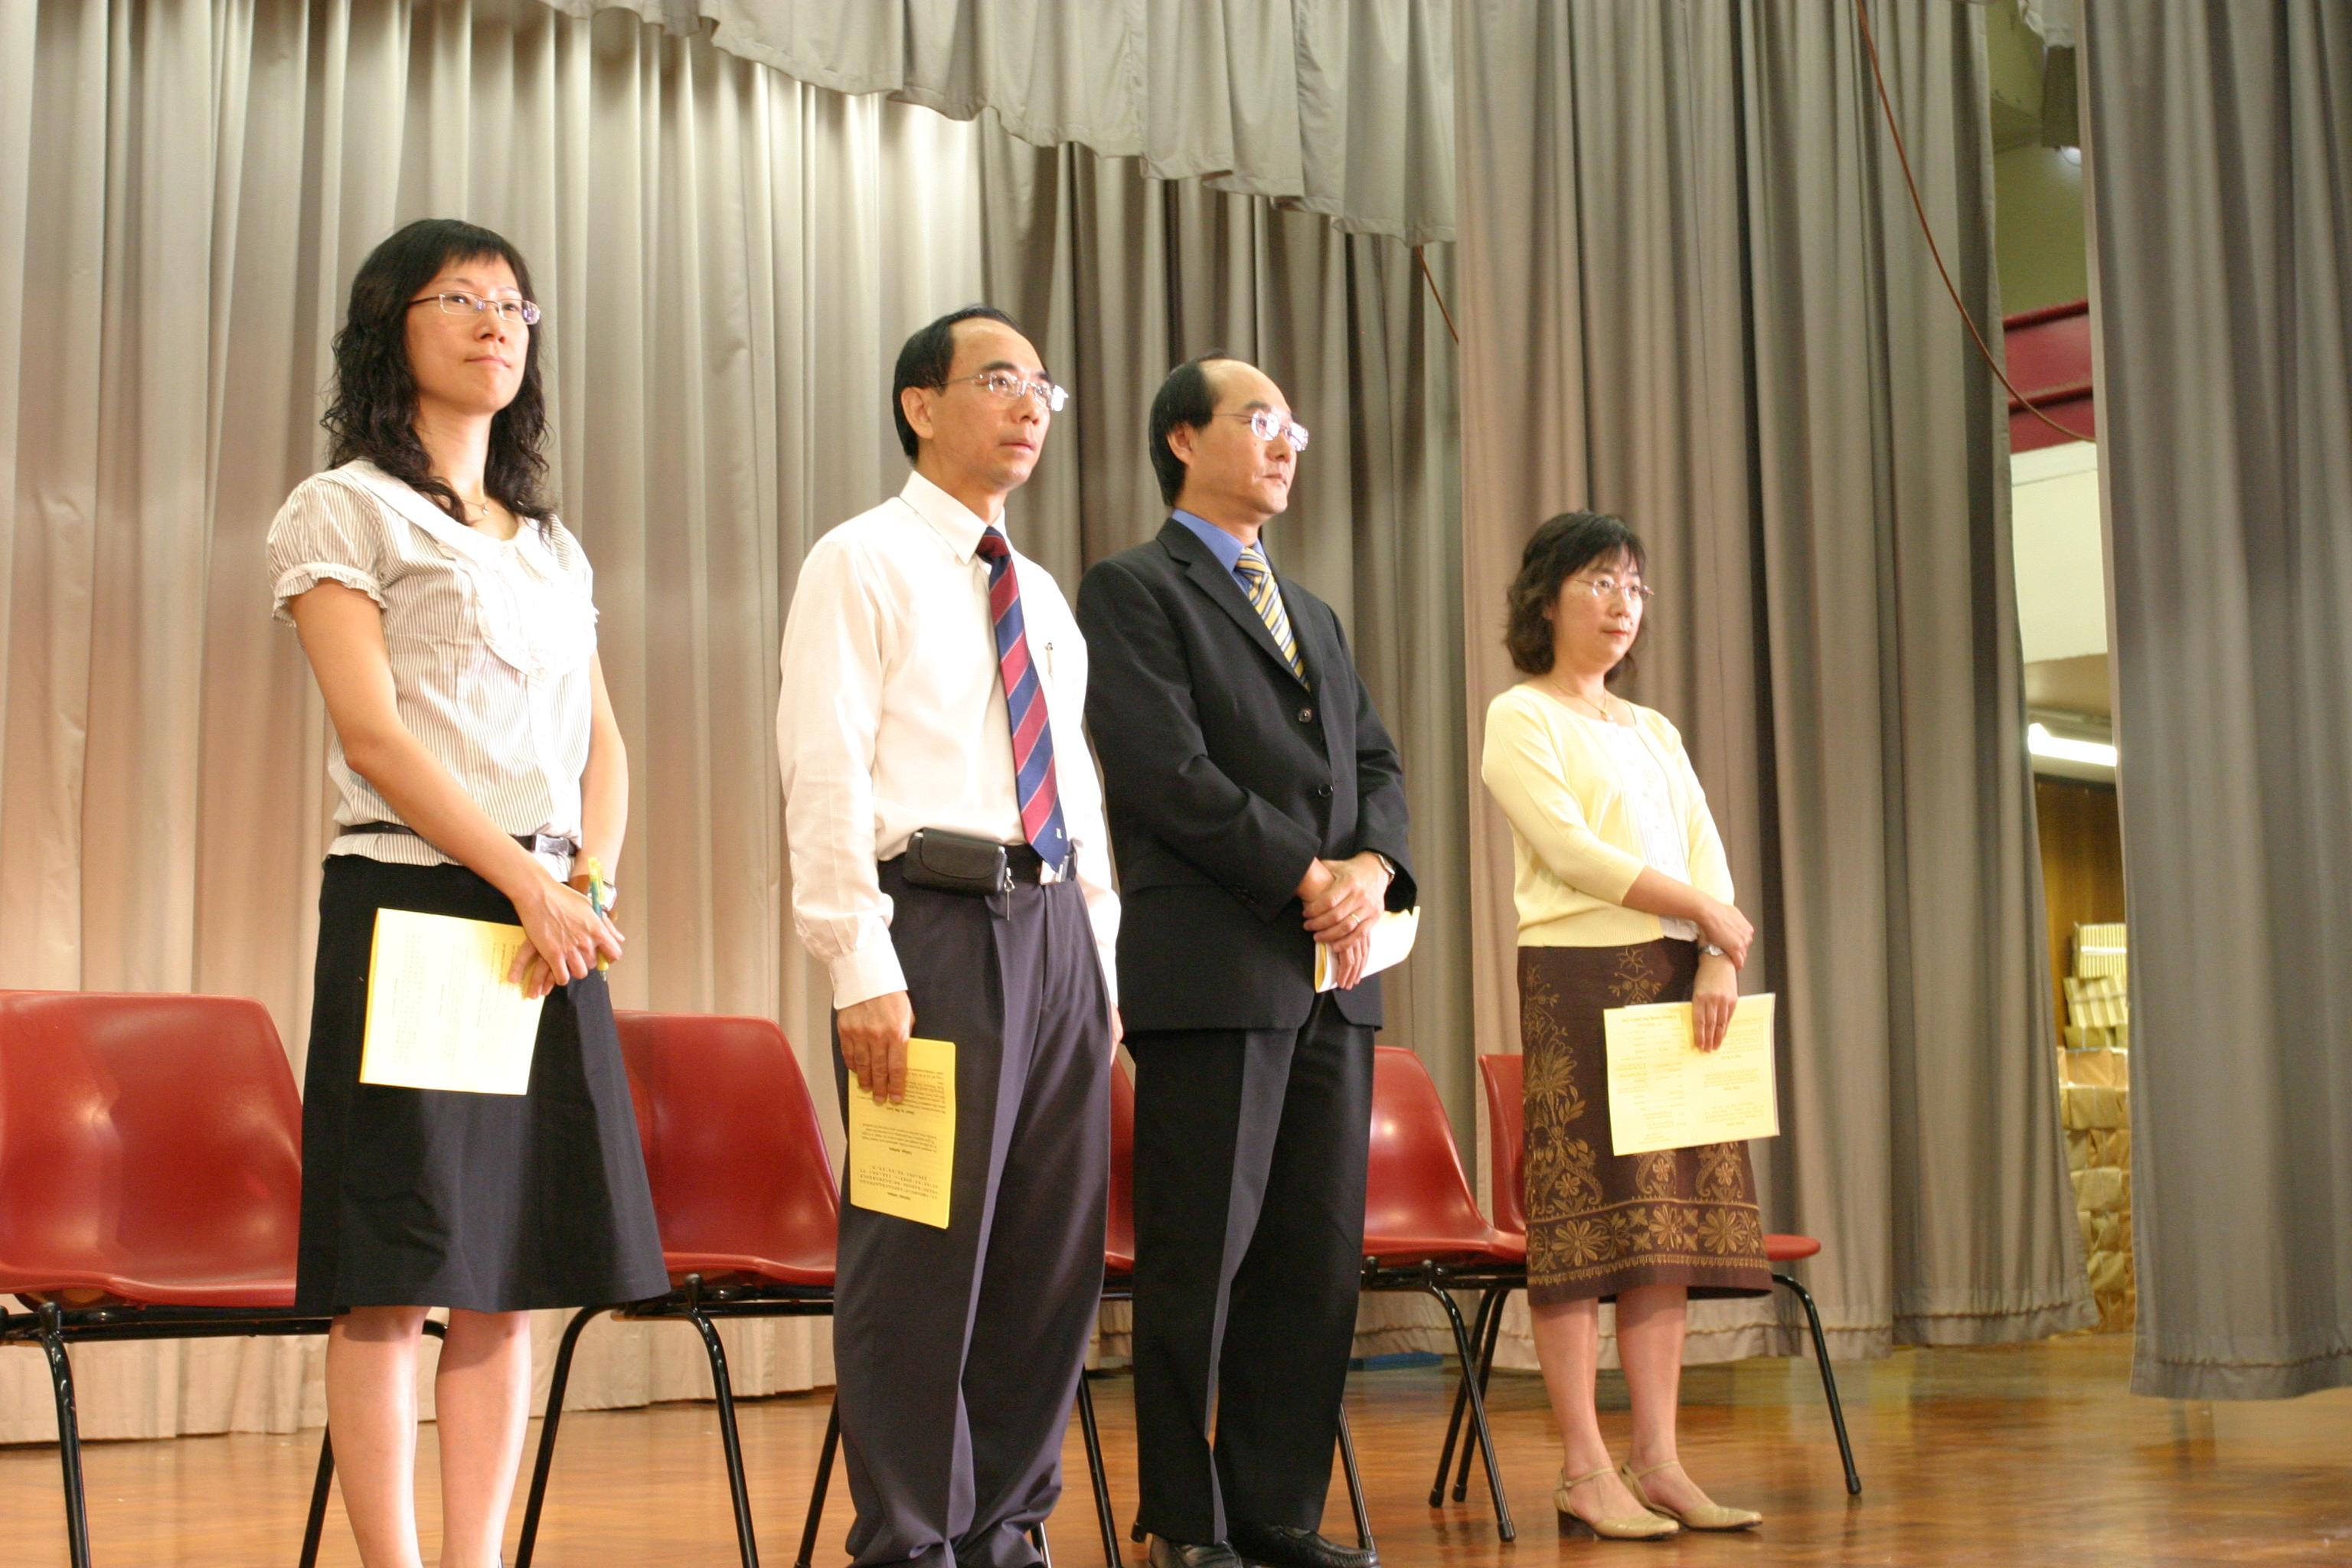 2008 09 01Openning Ceremony/image276